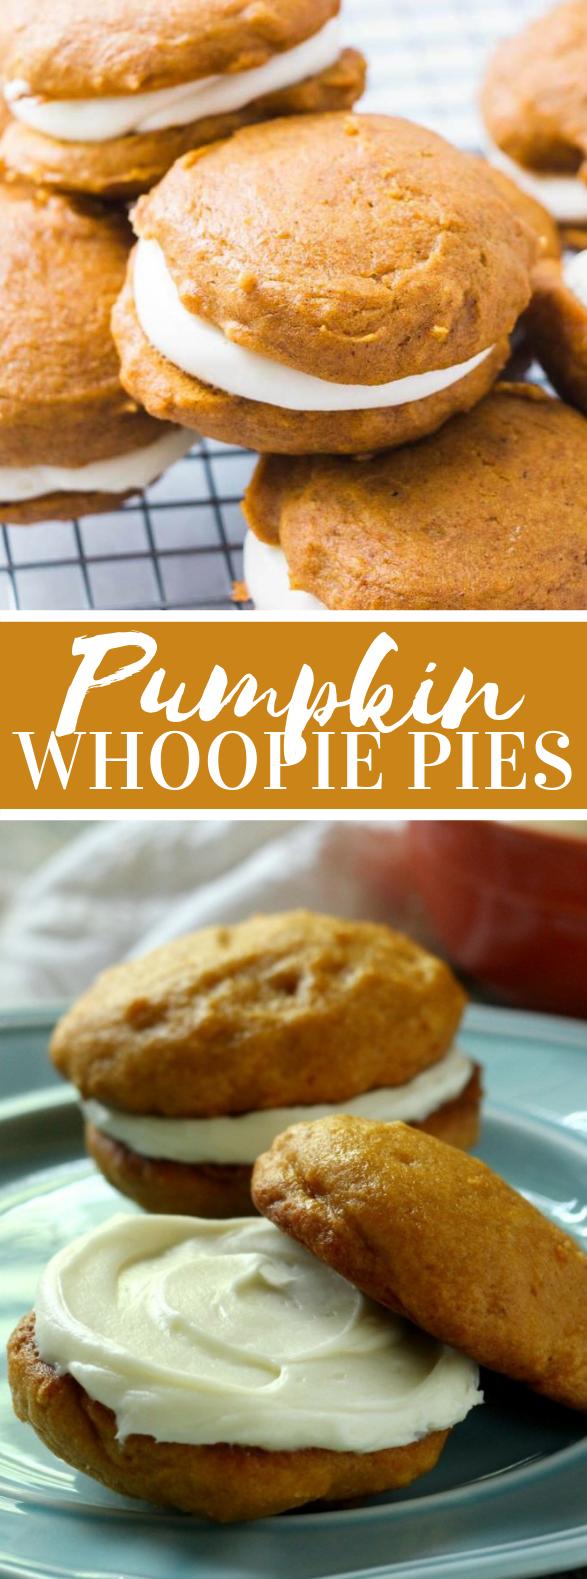 Cream Cheese Filled Pumpkin Whoopie Pies